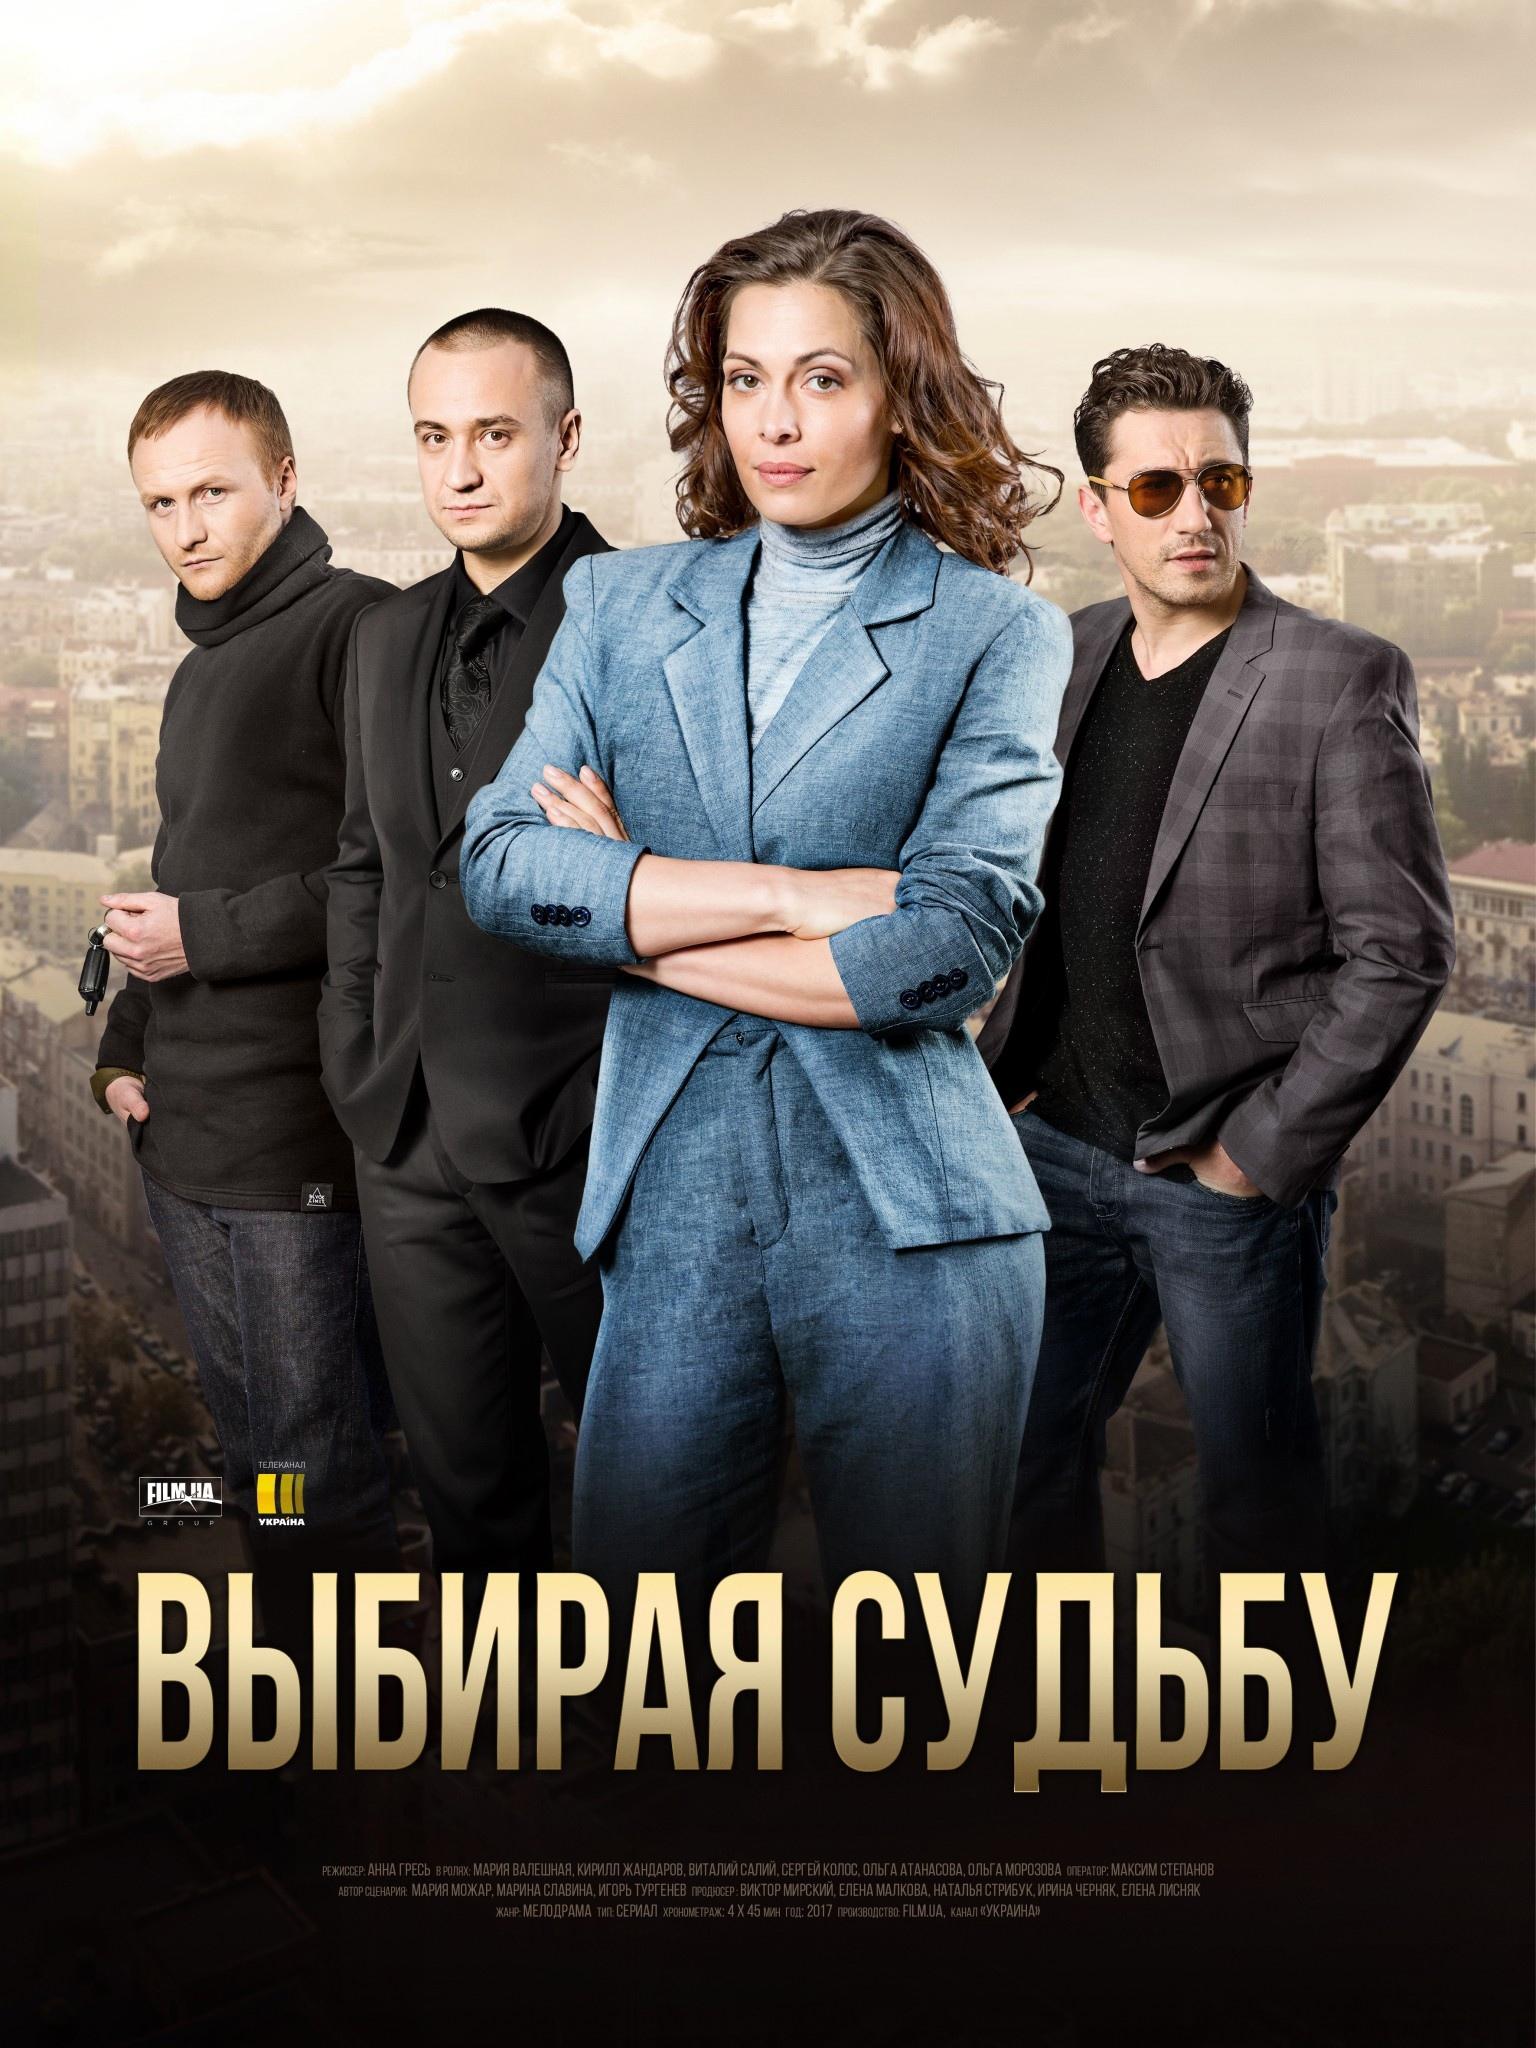 Мелодрама «Bыбиpaя cyдьбy» (2017) 1-4 серия из 4 HD